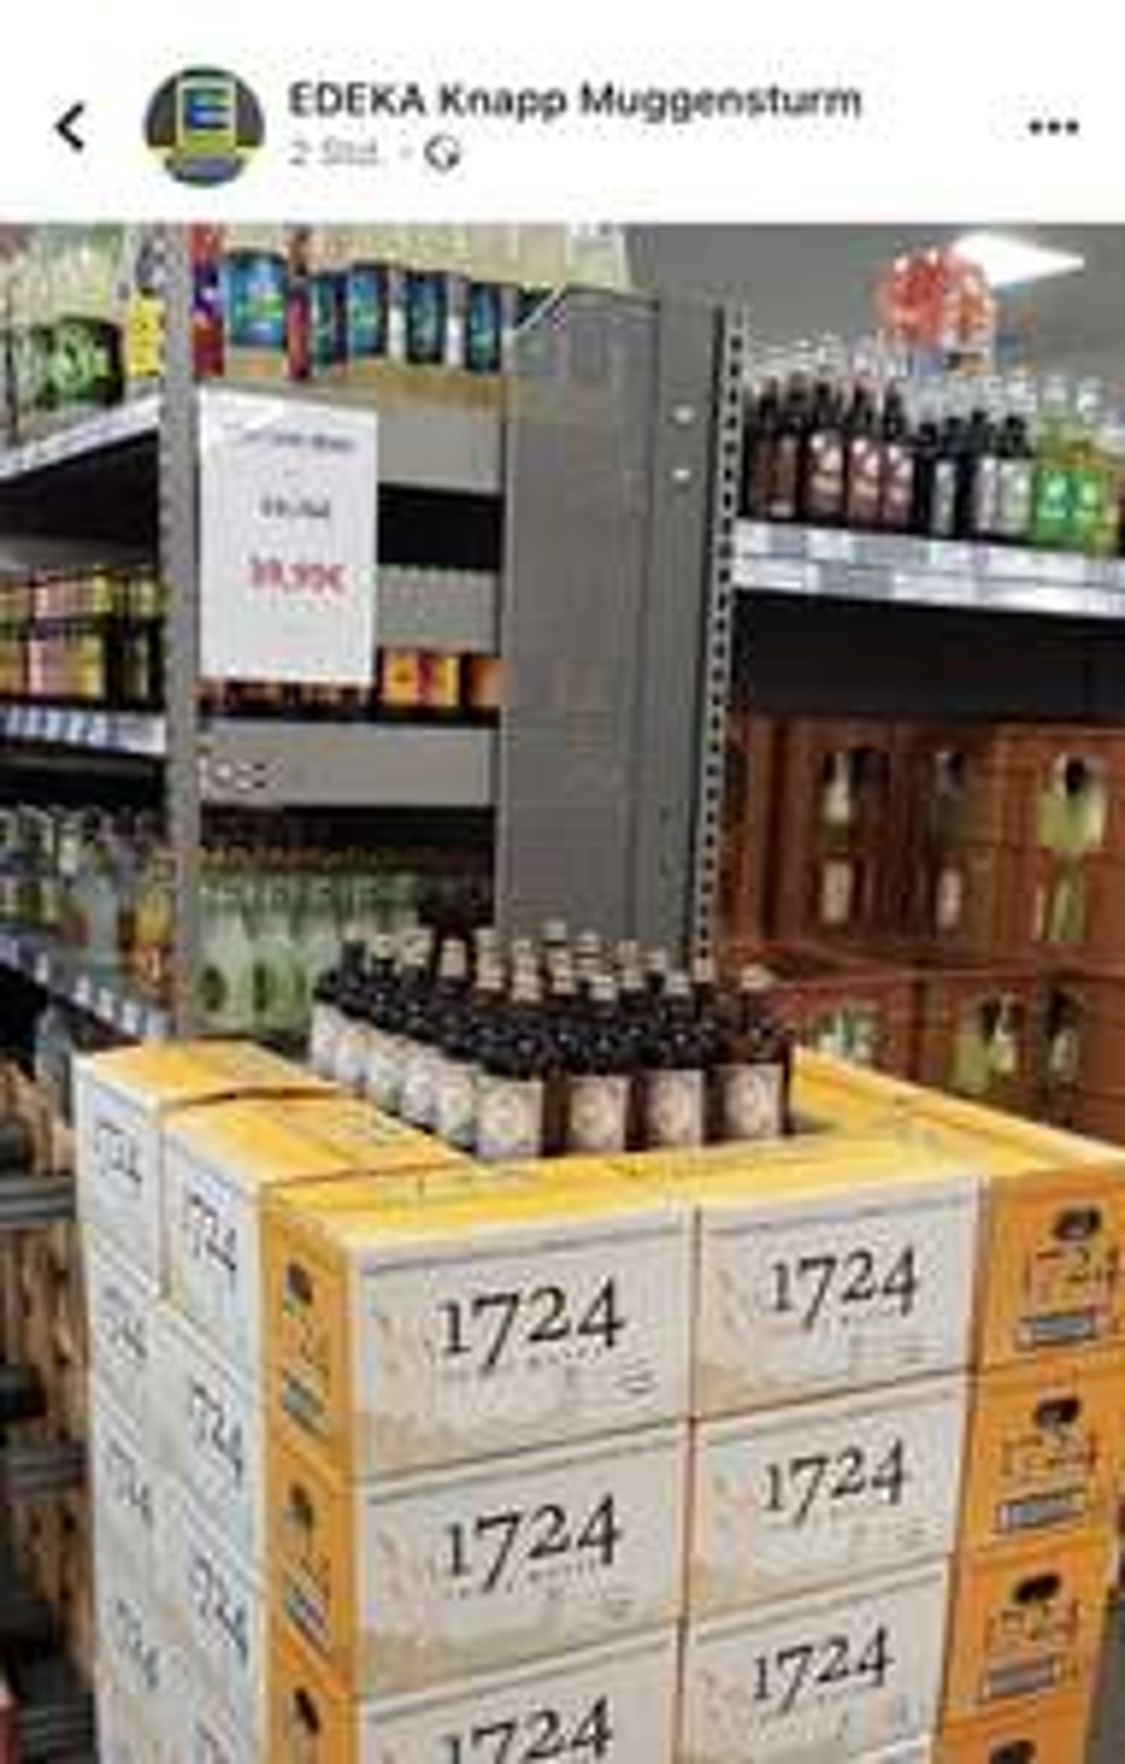 [Edeka Knapp Muggensturm]1724 Tonic Water - 24x für 39,99€ + Pfand. Ideal zum Monkey 47 Gin